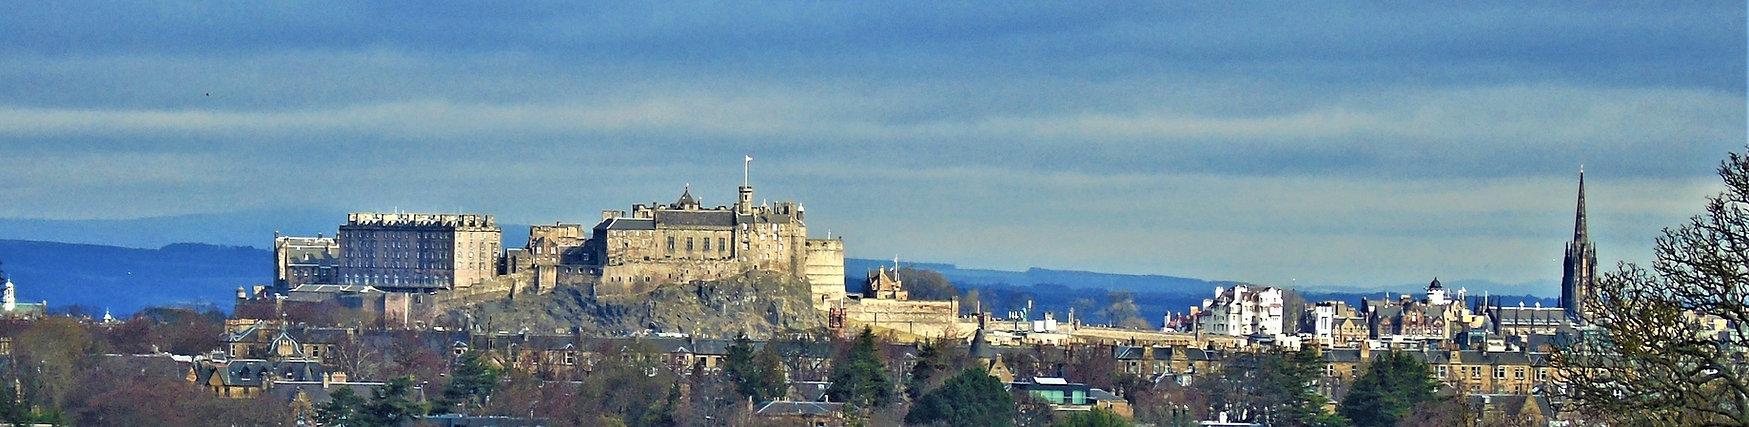 All About Edinburgh Attractions Edinburgh